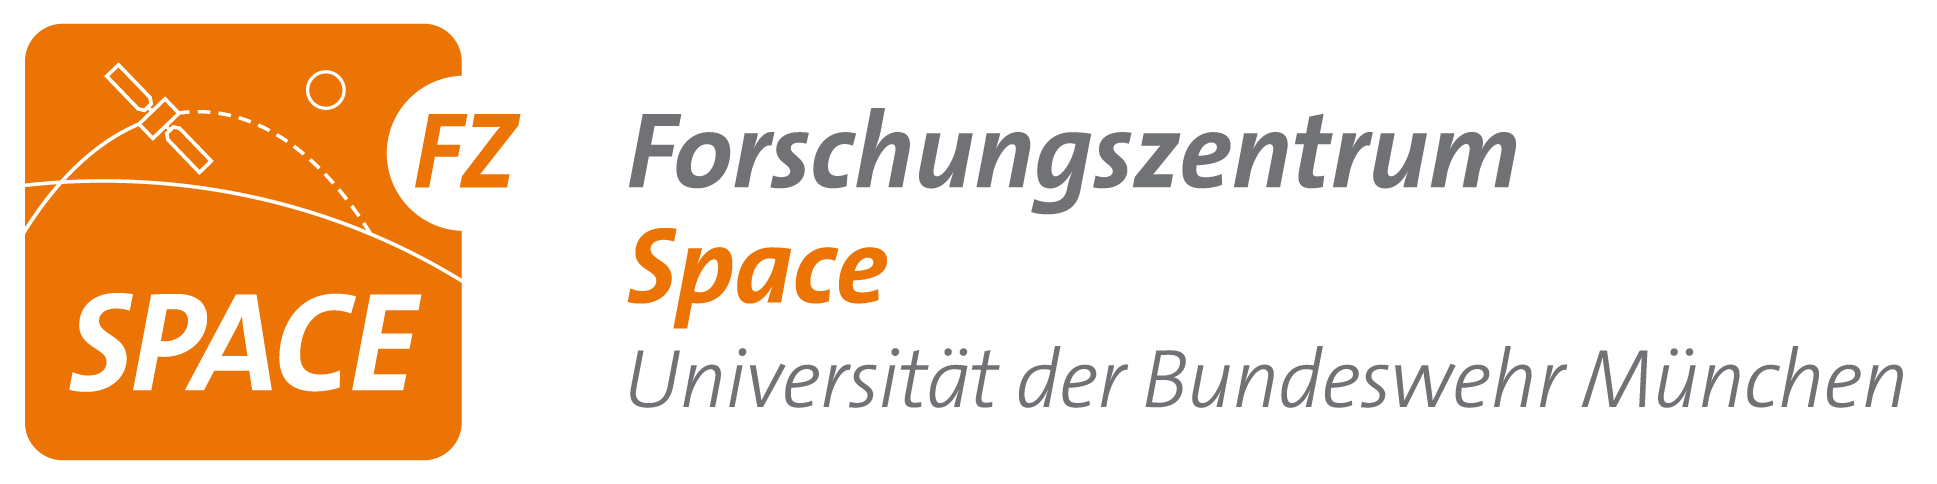 Logo_FZ-Space_de_300dpi.png